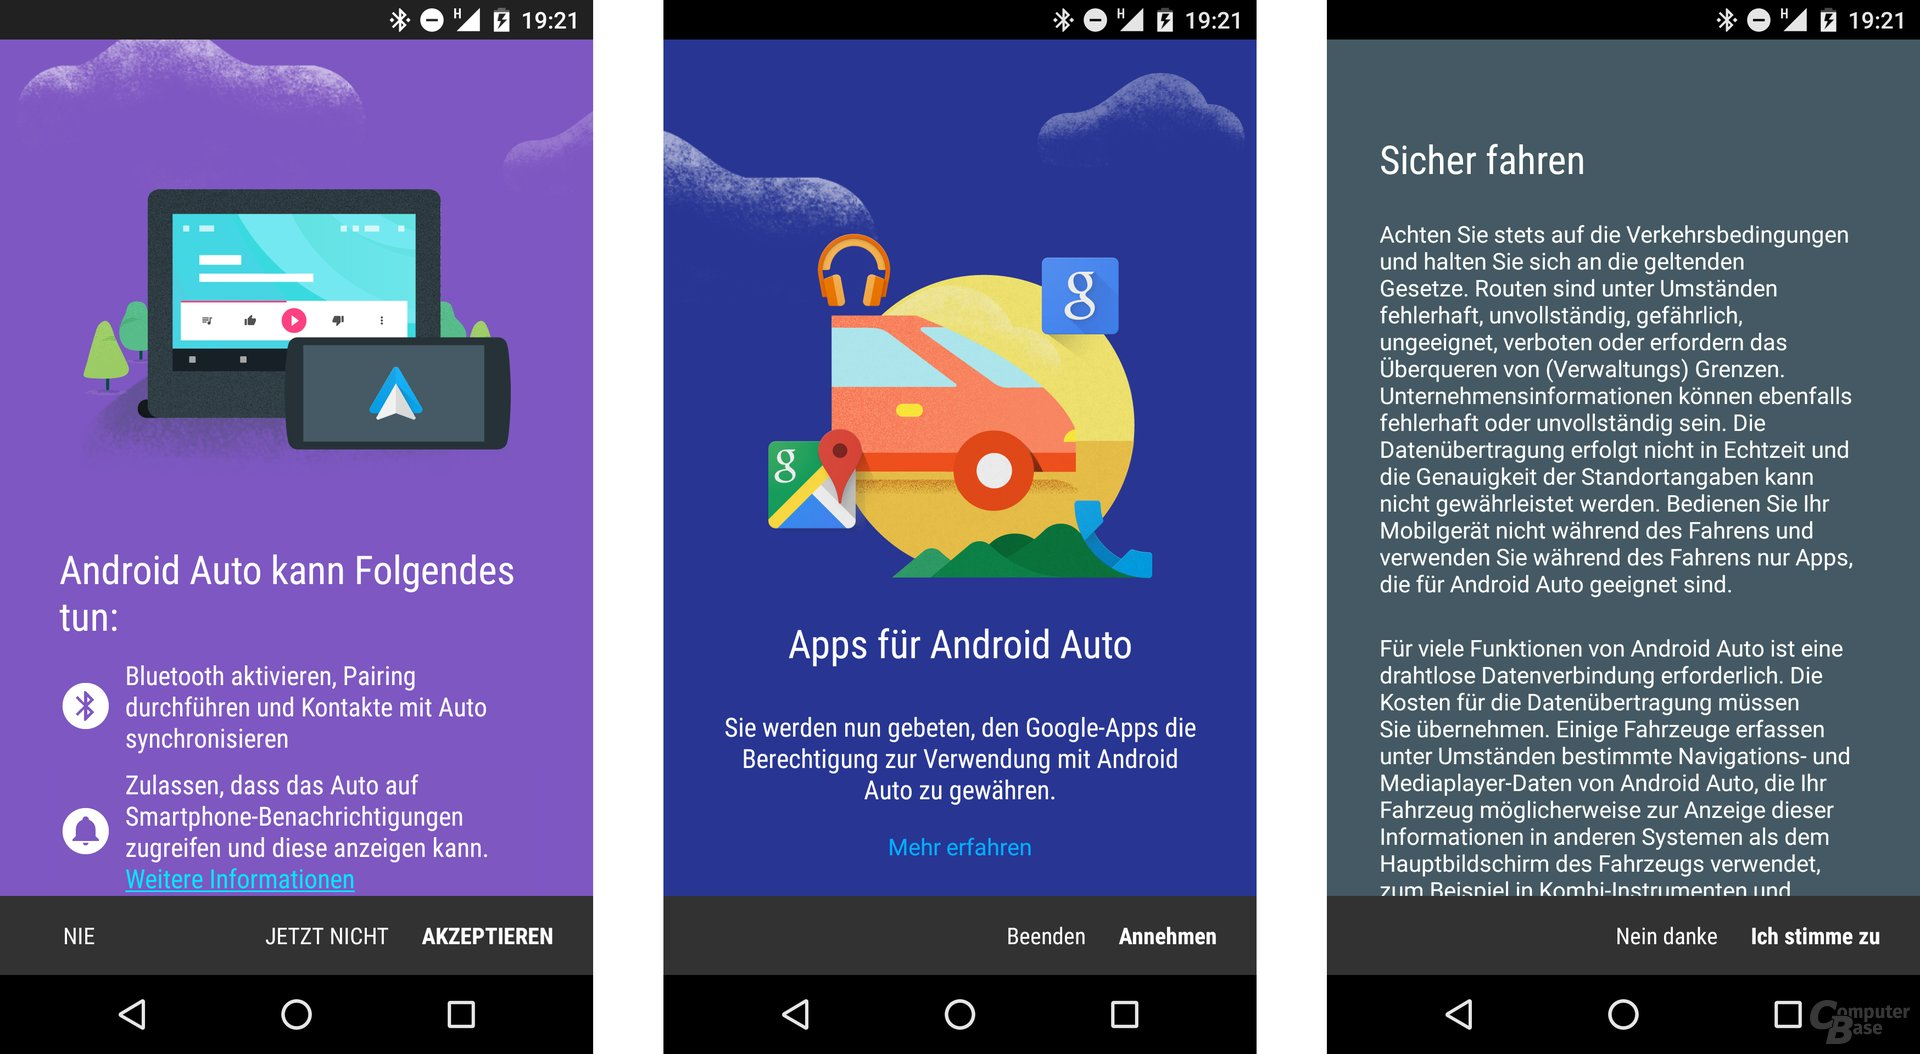 App für Android Auto